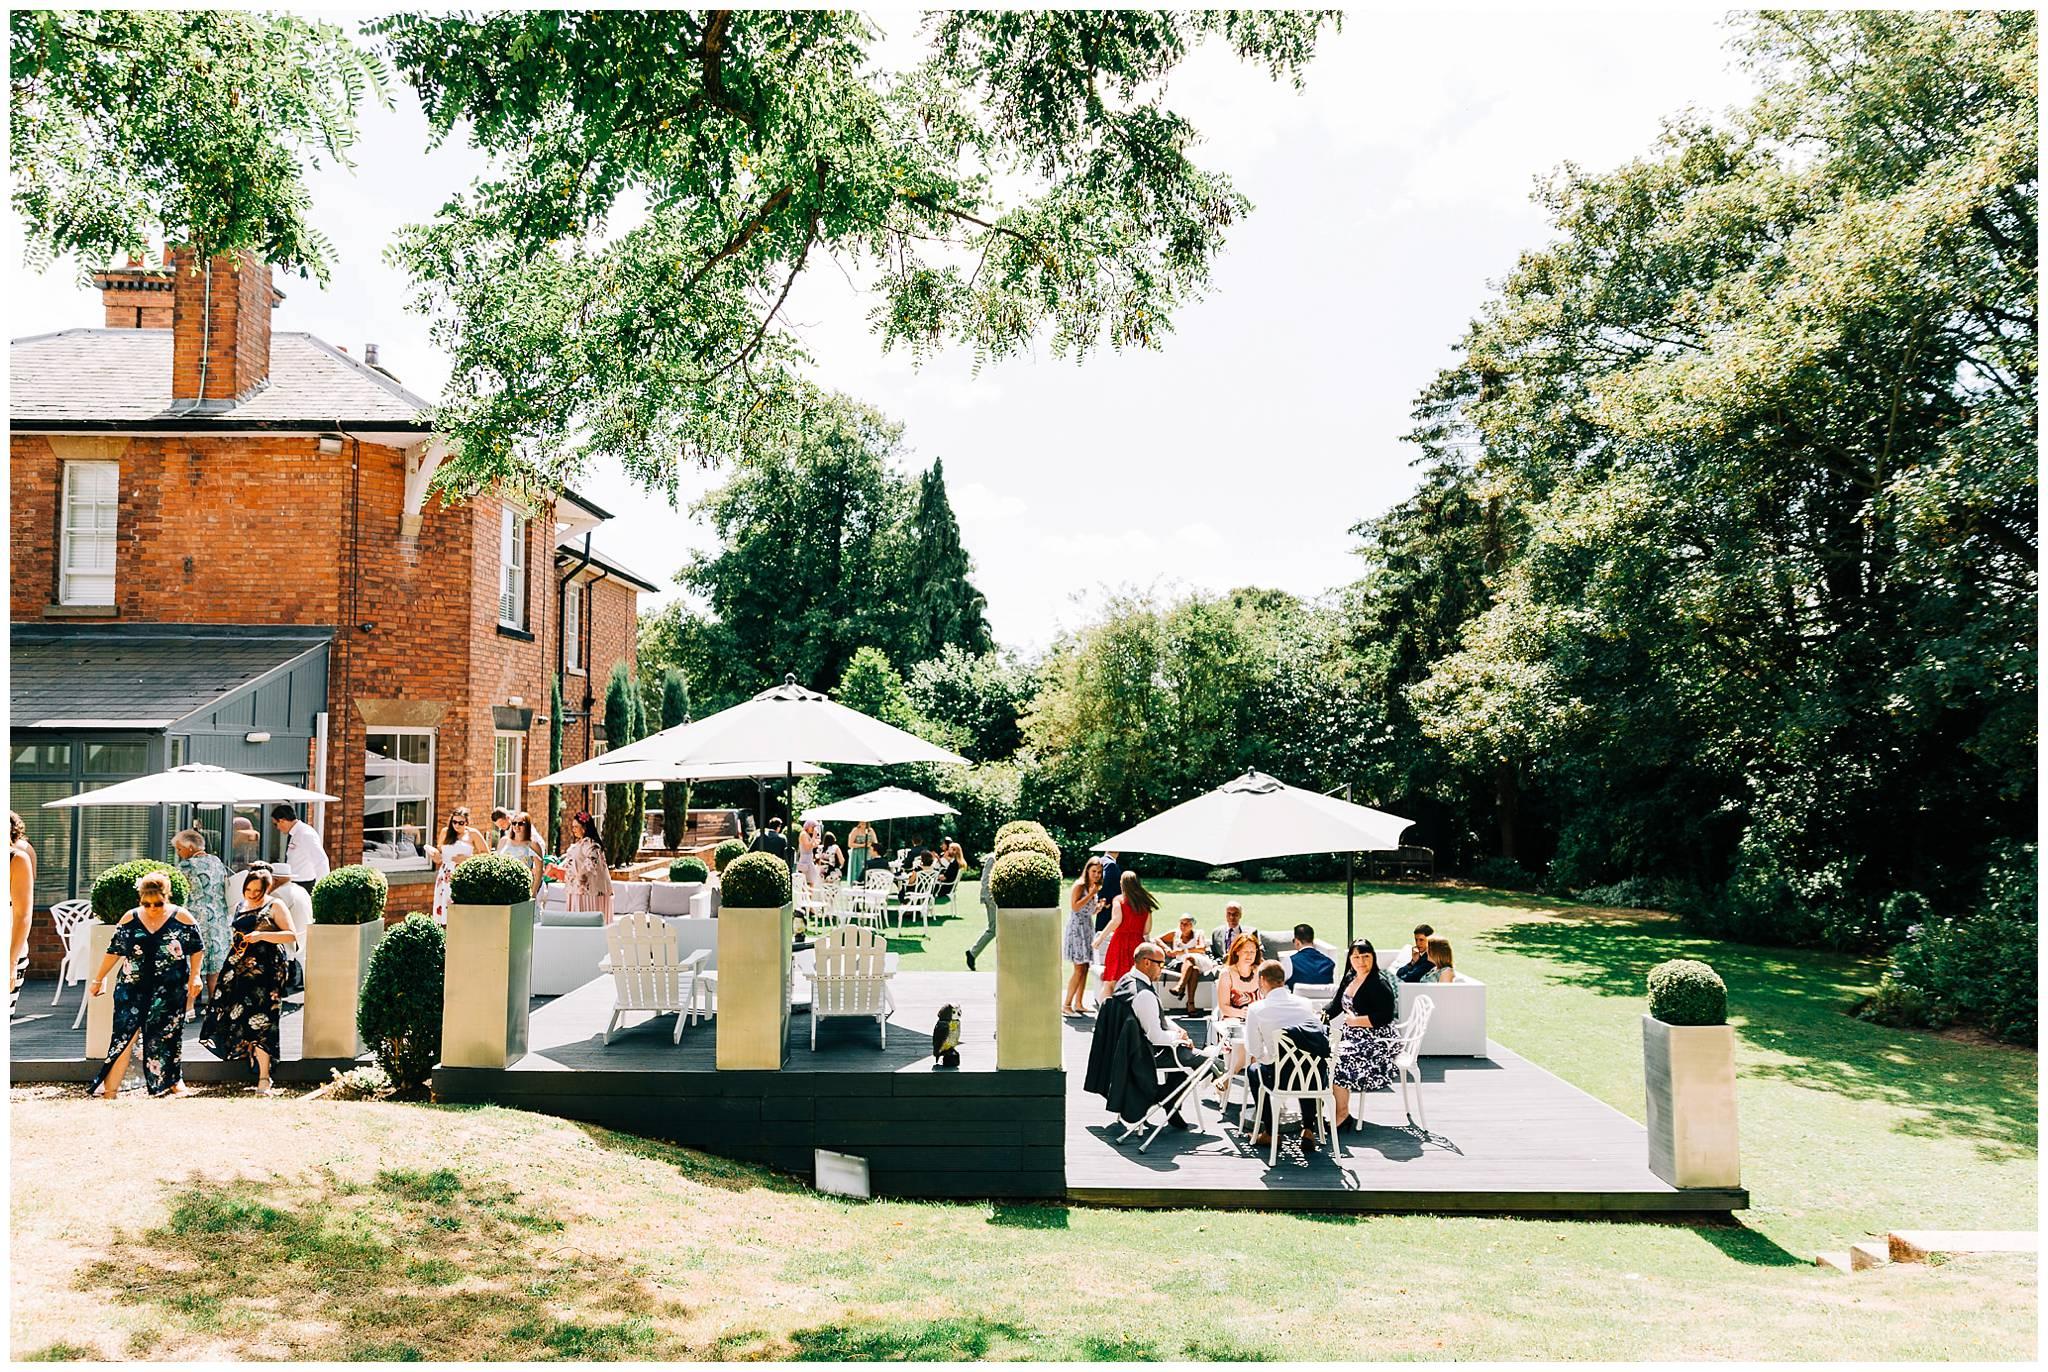 Summer Garden Wedding - The Old Vicarage Boutique Hotel33.jpg